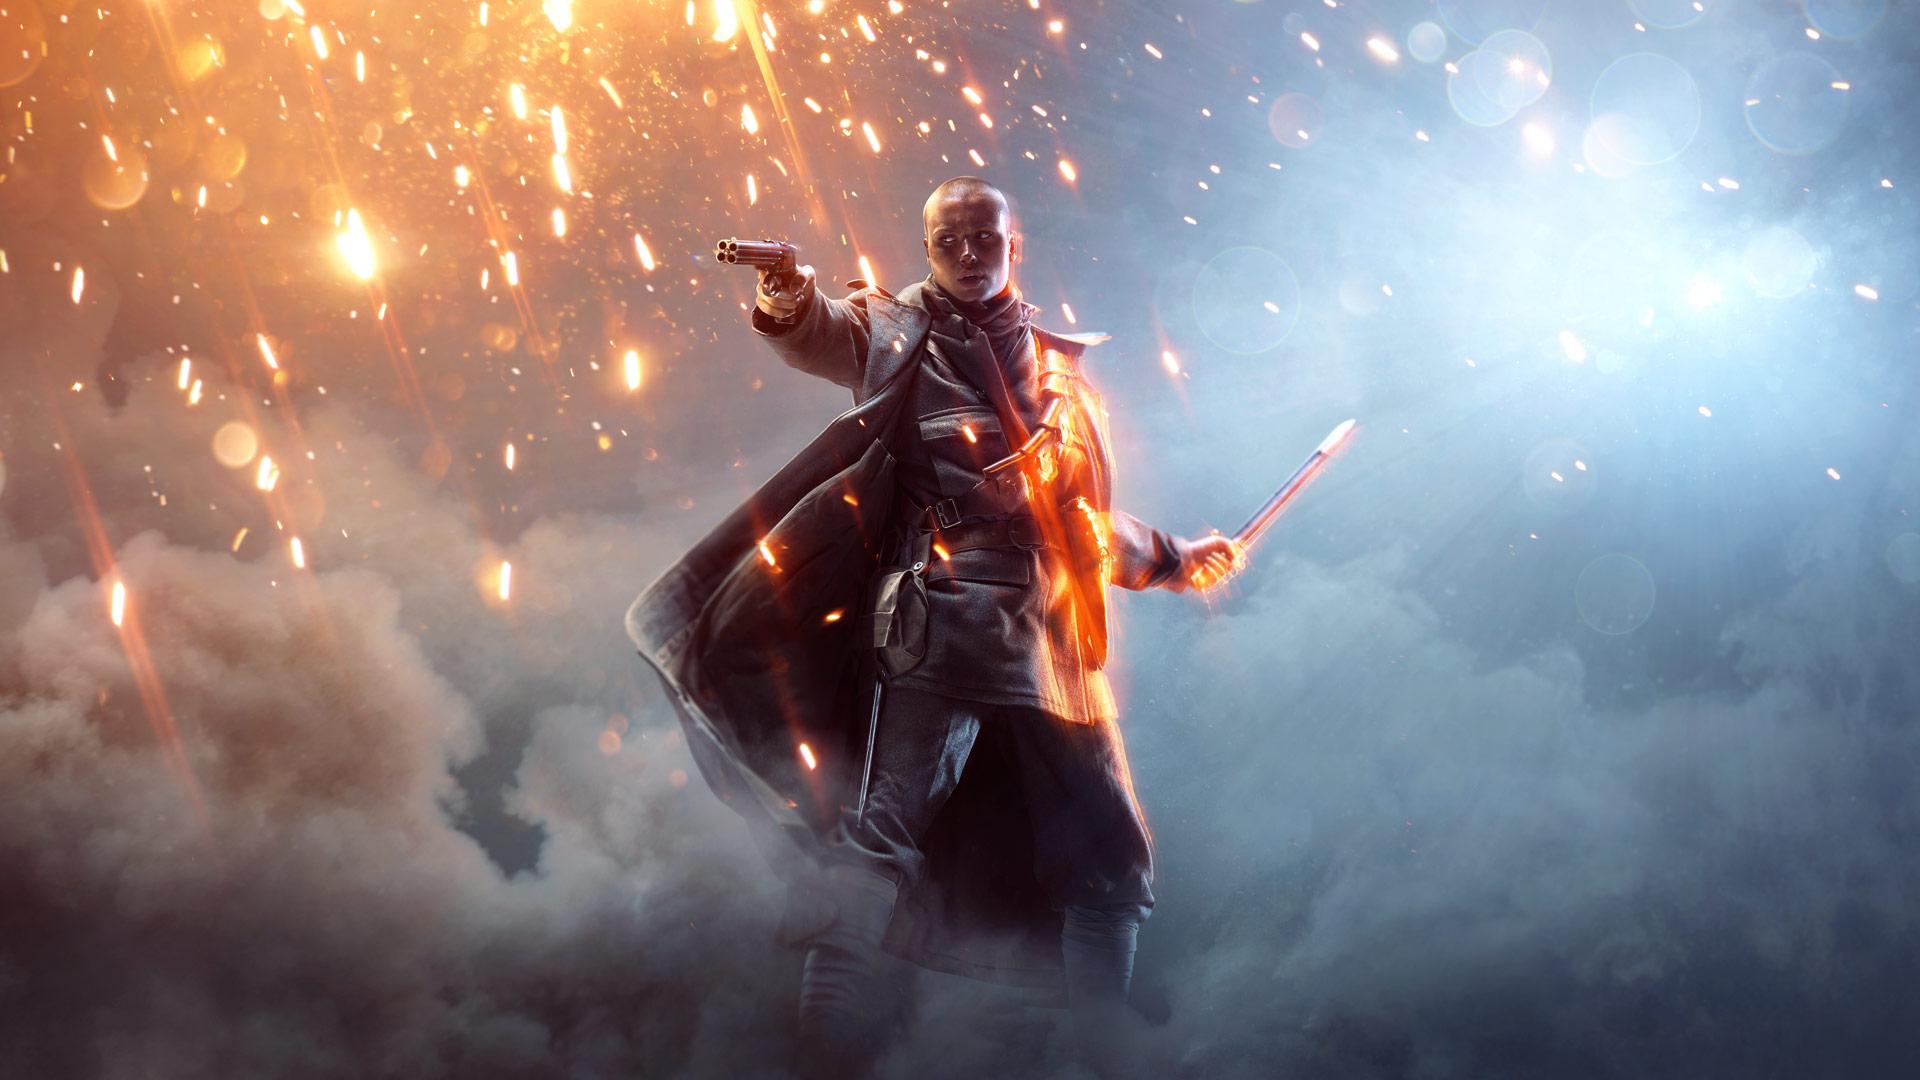 Battlefield 1 4k Ultra Tapeta Hd: 「バトルフィールド 1 Revolution」で戦列に加わろう